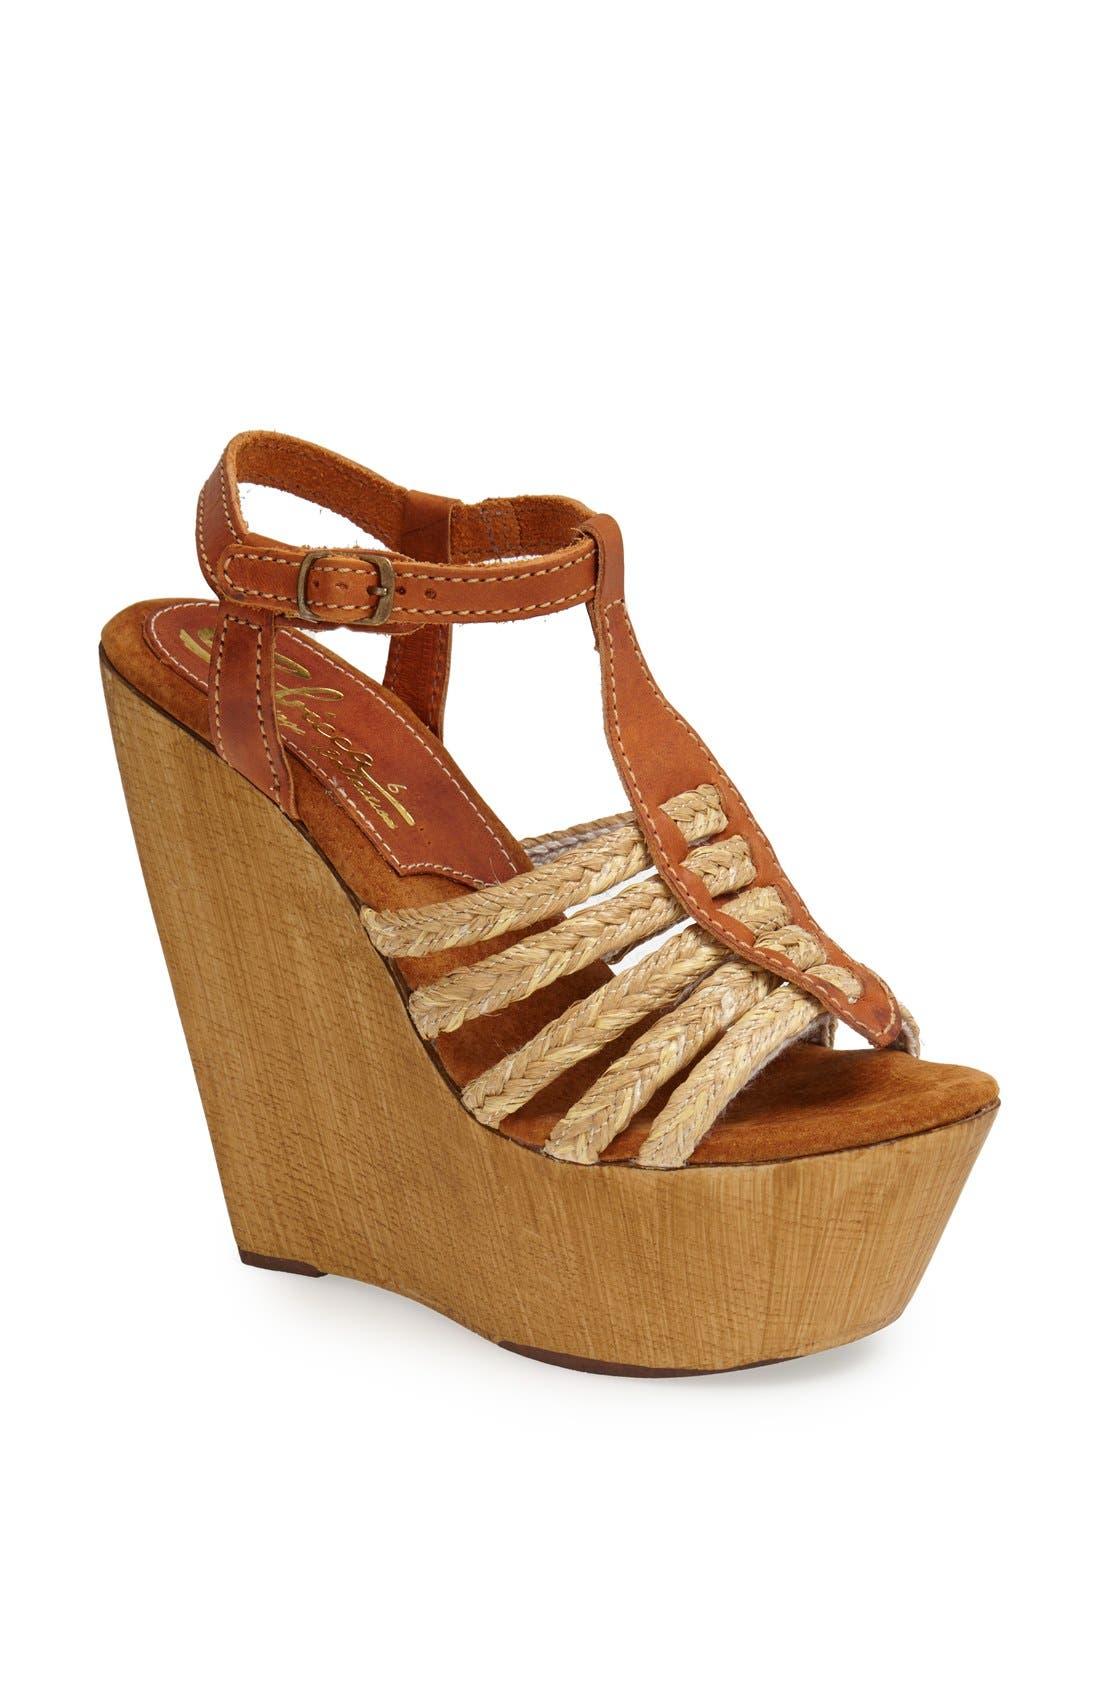 Alternate Image 1 Selected - Sbicca 'Bimini' Wedge Sandal